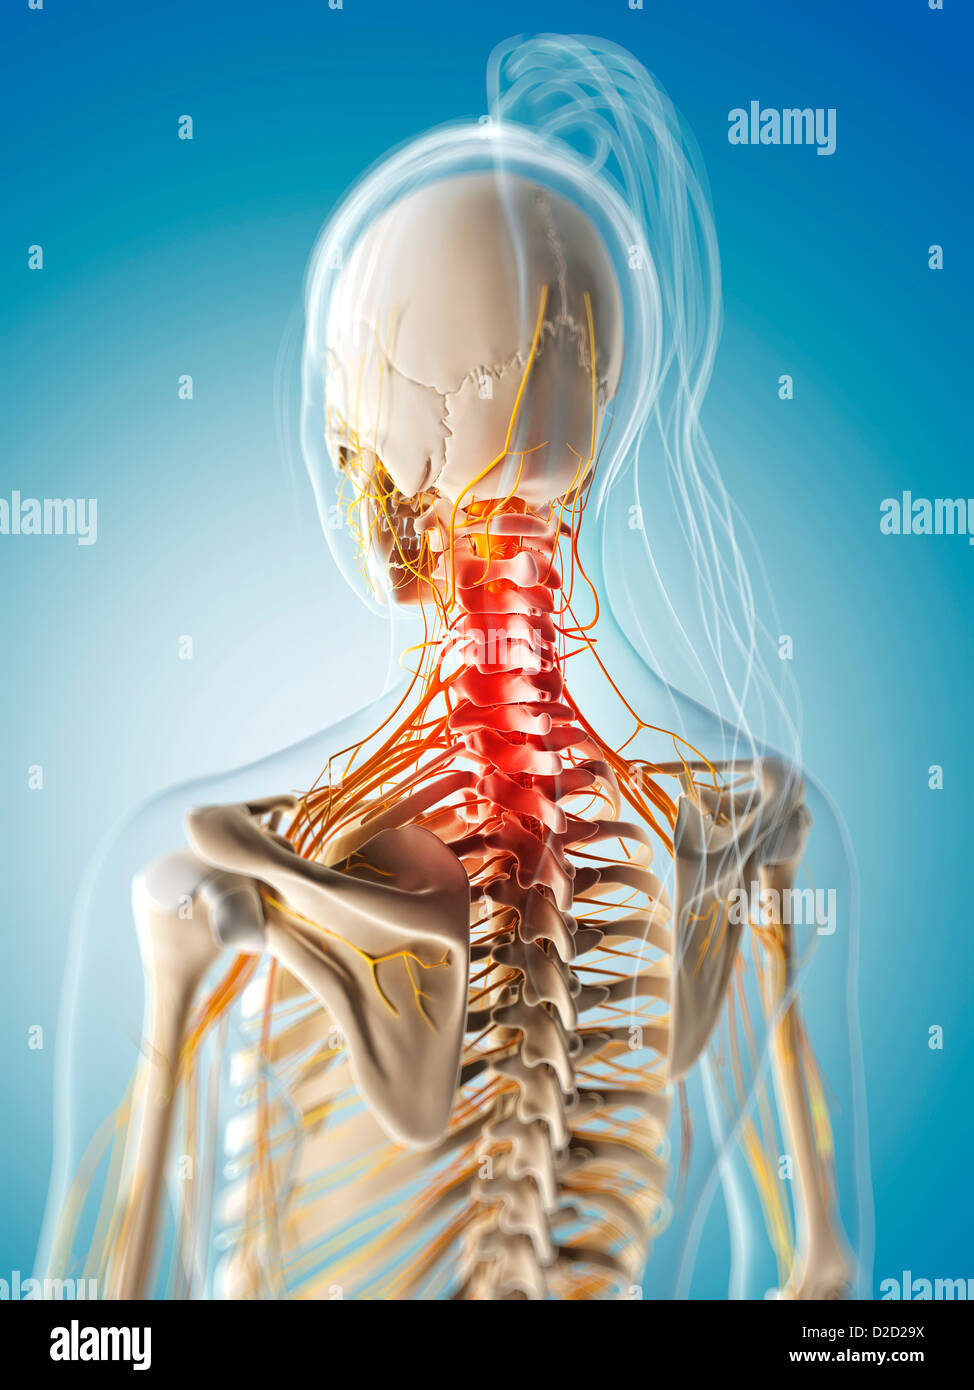 Neck Pain Anatomy Stock Photos & Neck Pain Anatomy Stock Images - Alamy